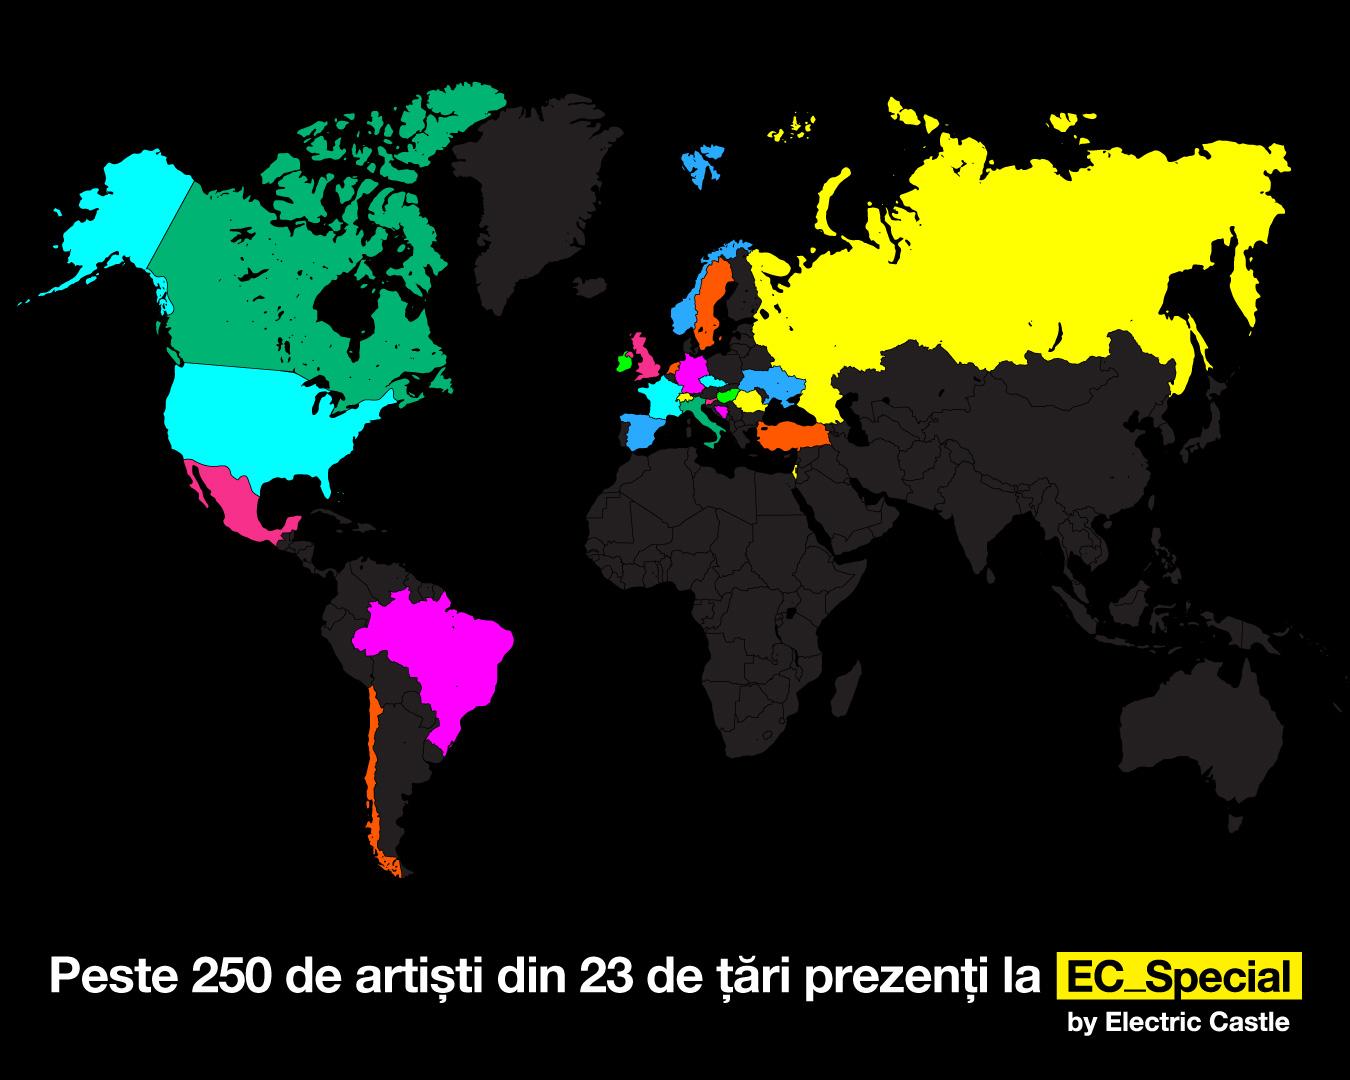 250 de artiști din 23 de țări, de pe 3 continente, vin la EC_Special by Electric Castle